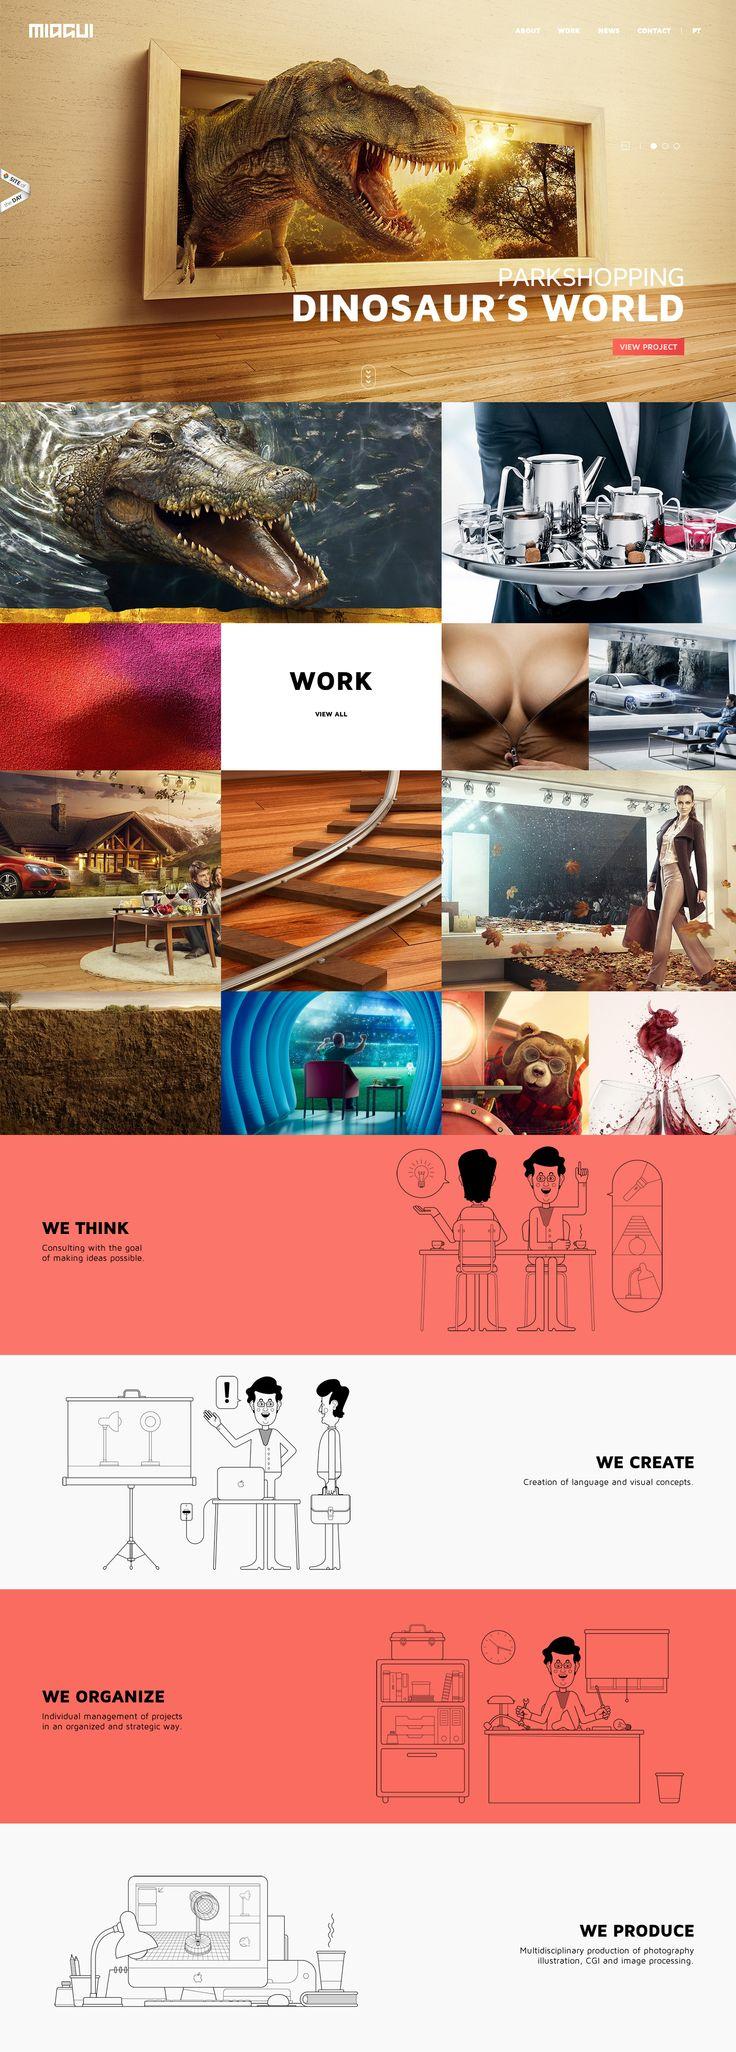 Miagui Imagevertising, 12 September 2013. http://www.awwwards.com/web-design-awards/miagui-imagevertising   #ArtIllustration #Illustration #Photography #Design #Portfolio #Graphic design